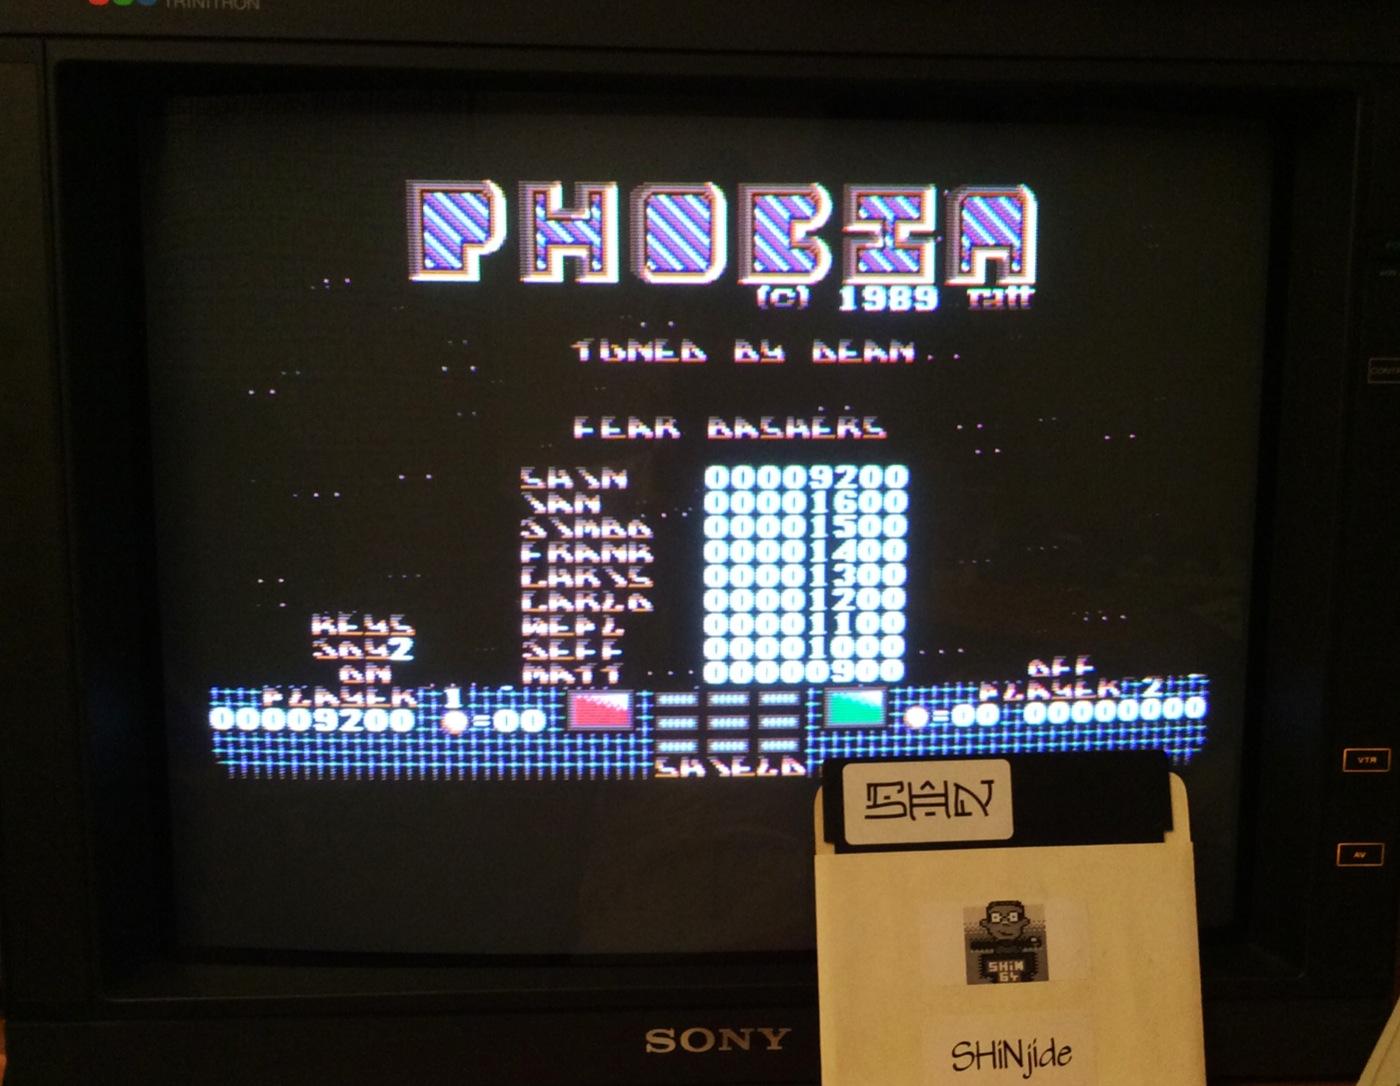 SHiNjide: Phobia (Amiga) 9,200 points on 2014-09-06 16:55:24